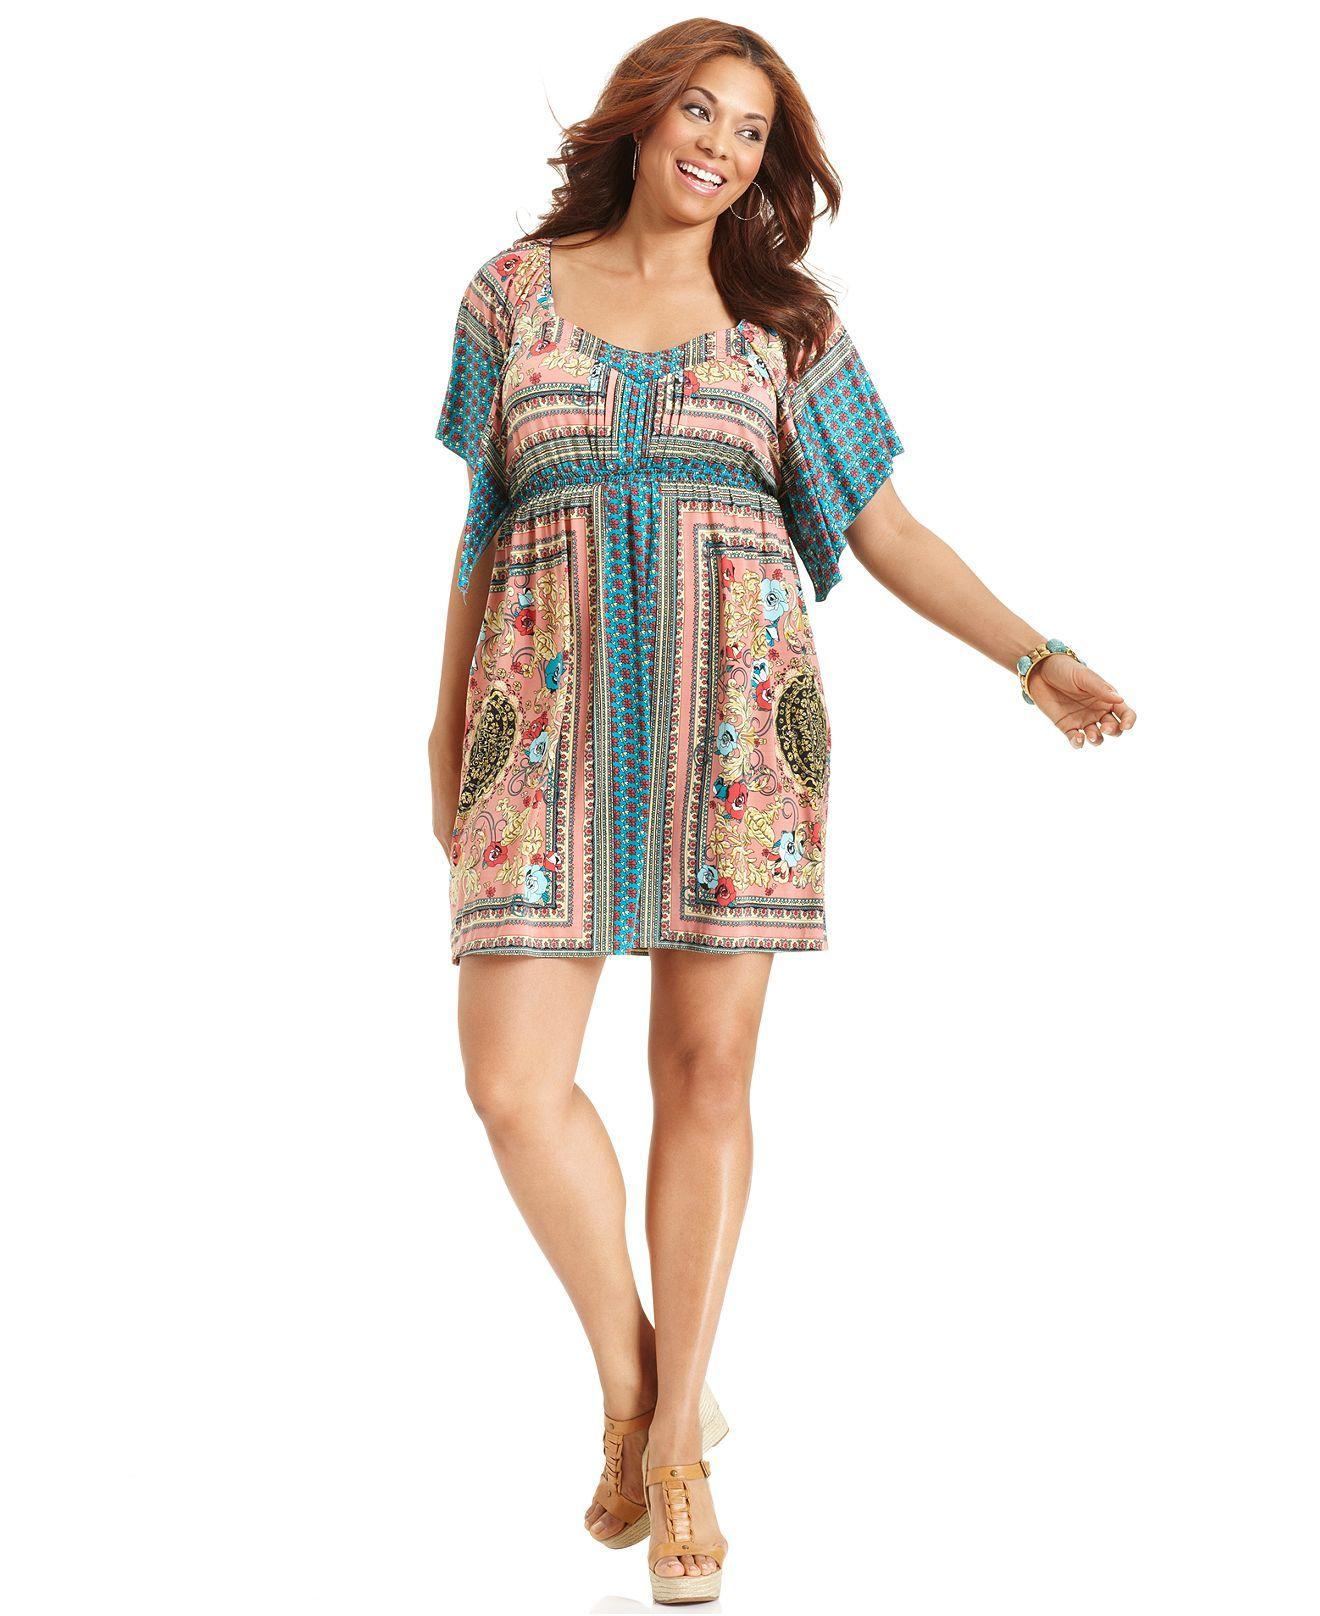 Style Plus Size Dress Short Sleeve Printed Empire Dresses